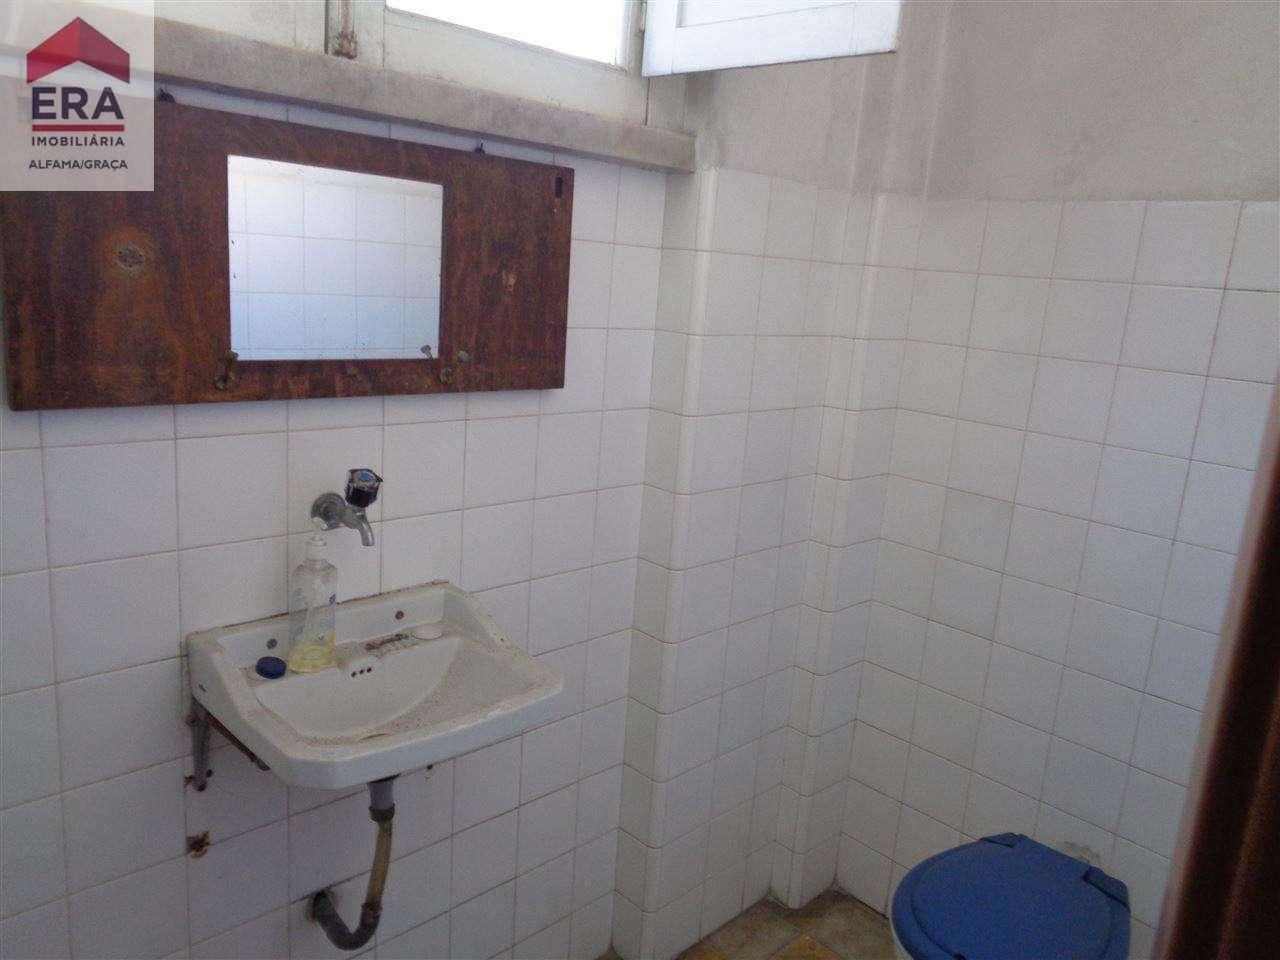 Armazém para arrendar, Penha de França, Lisboa - Foto 7